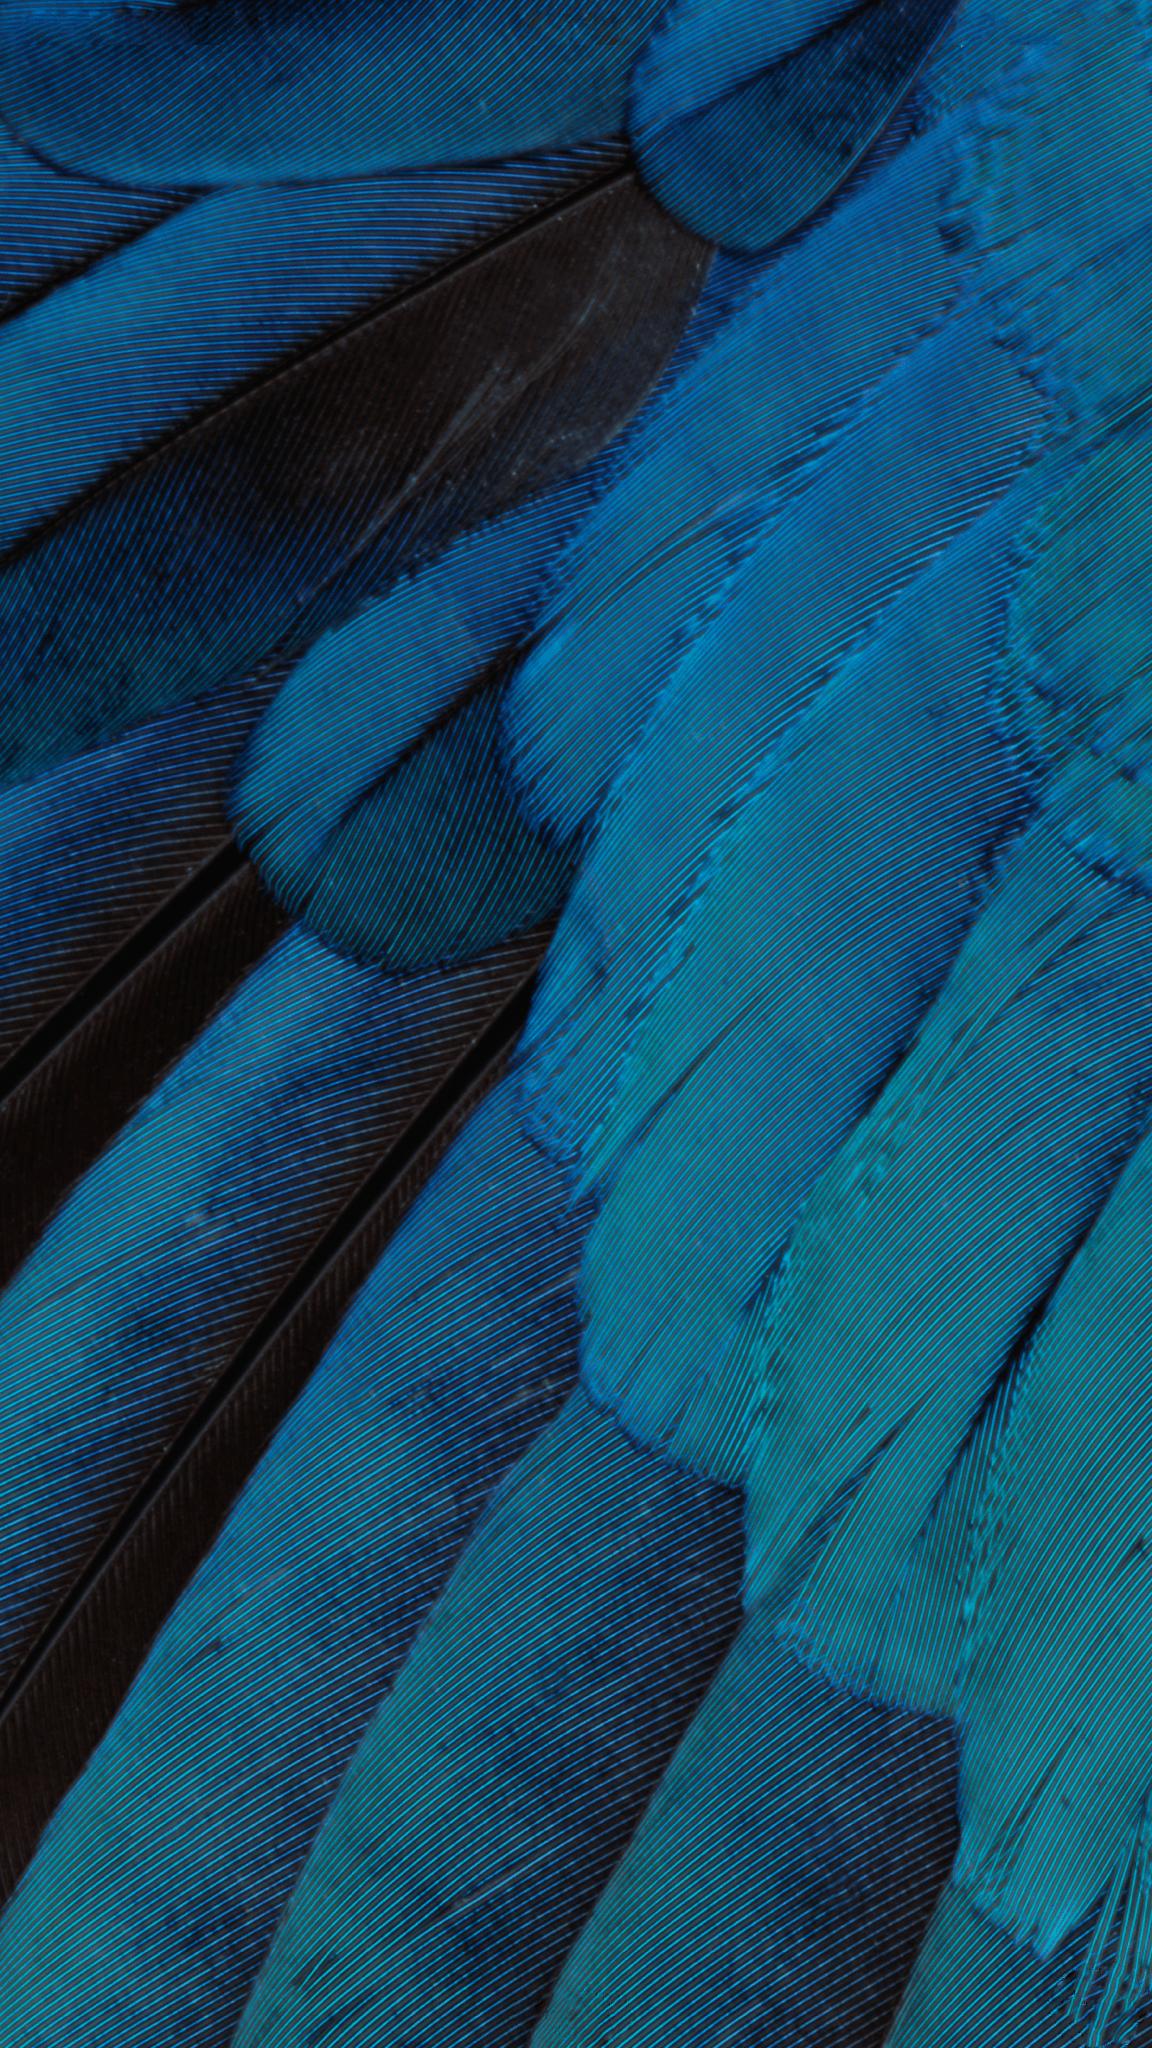 ios 9 feather wallpaper 2